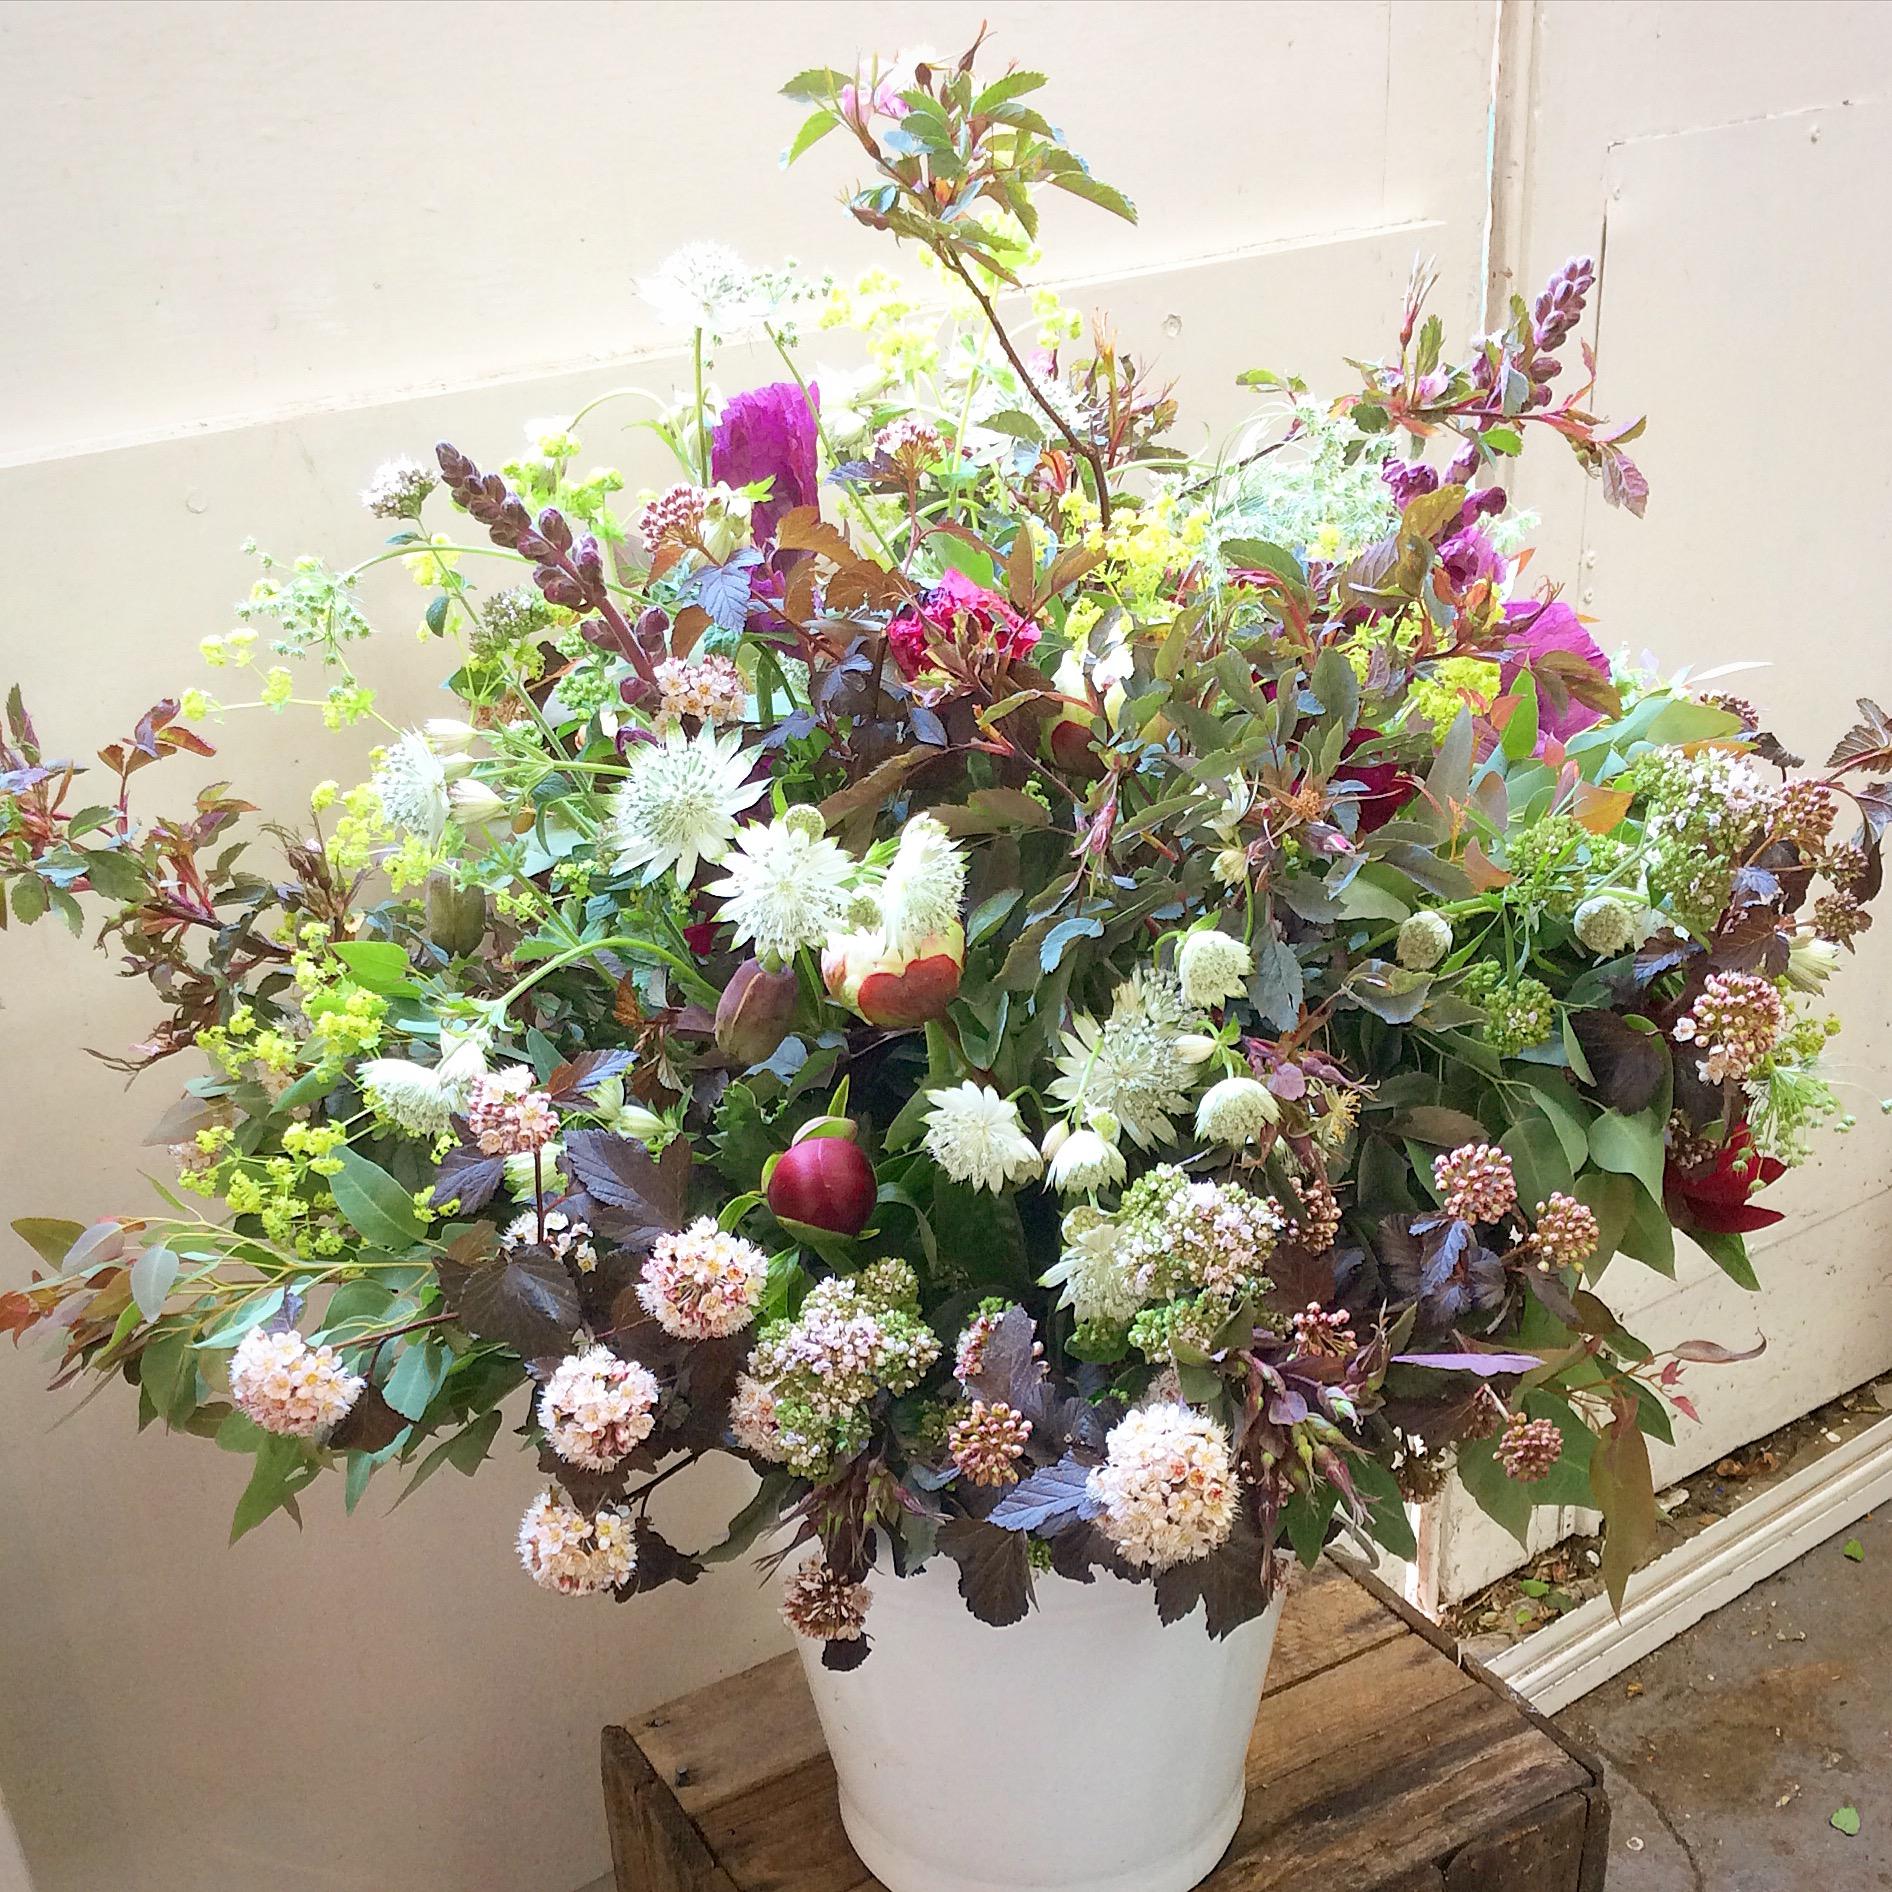 Enamel Bucket of Seasonal Flowers